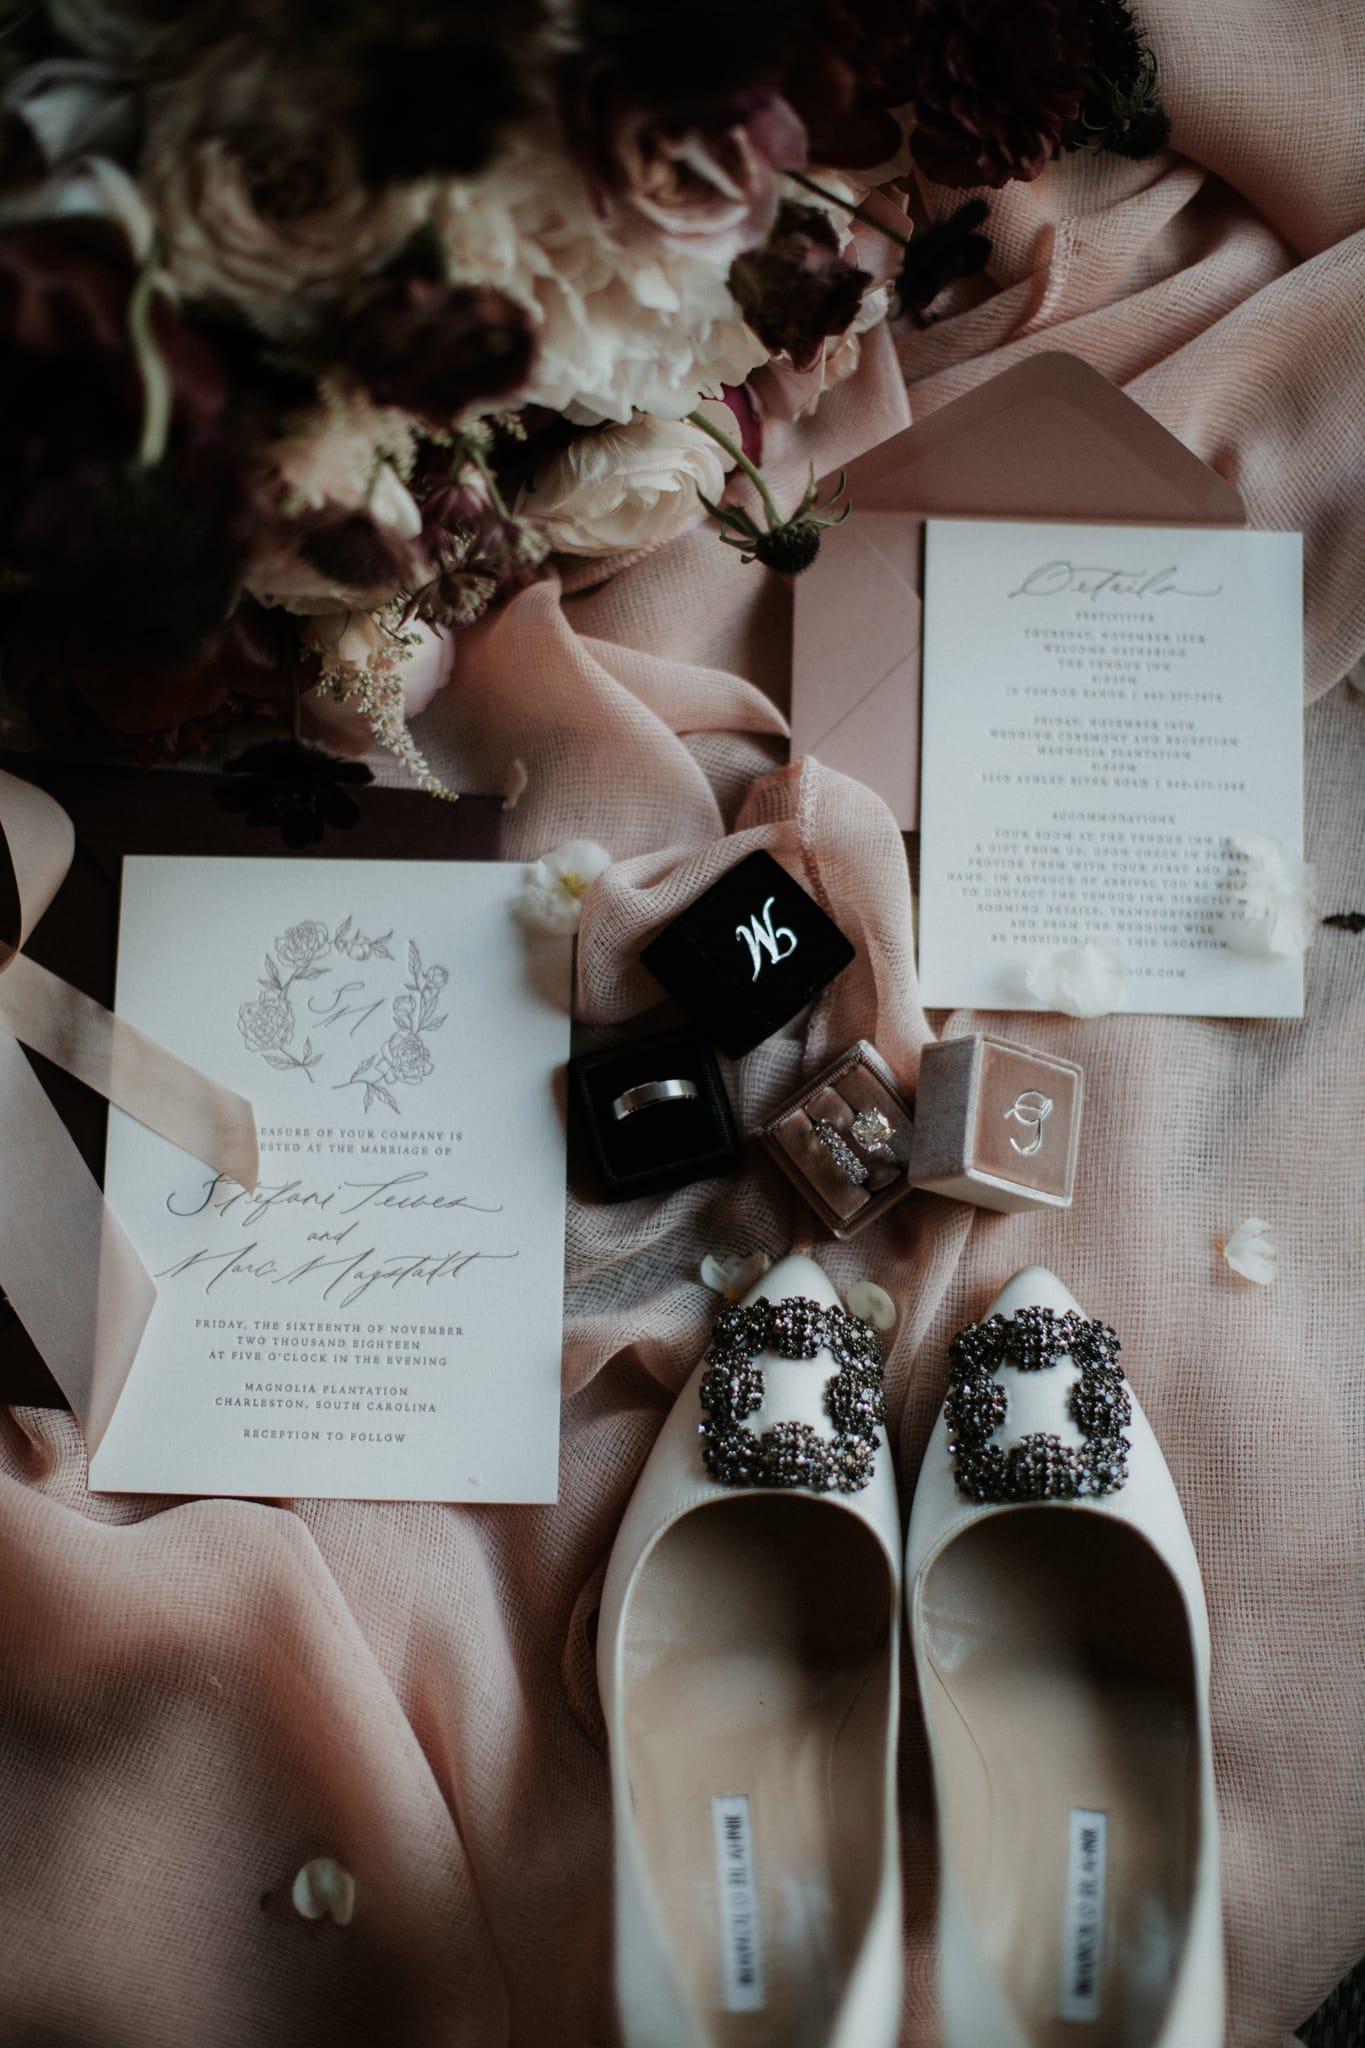 Magnolia-plantation-wedding-charleston-sc-2.jpg